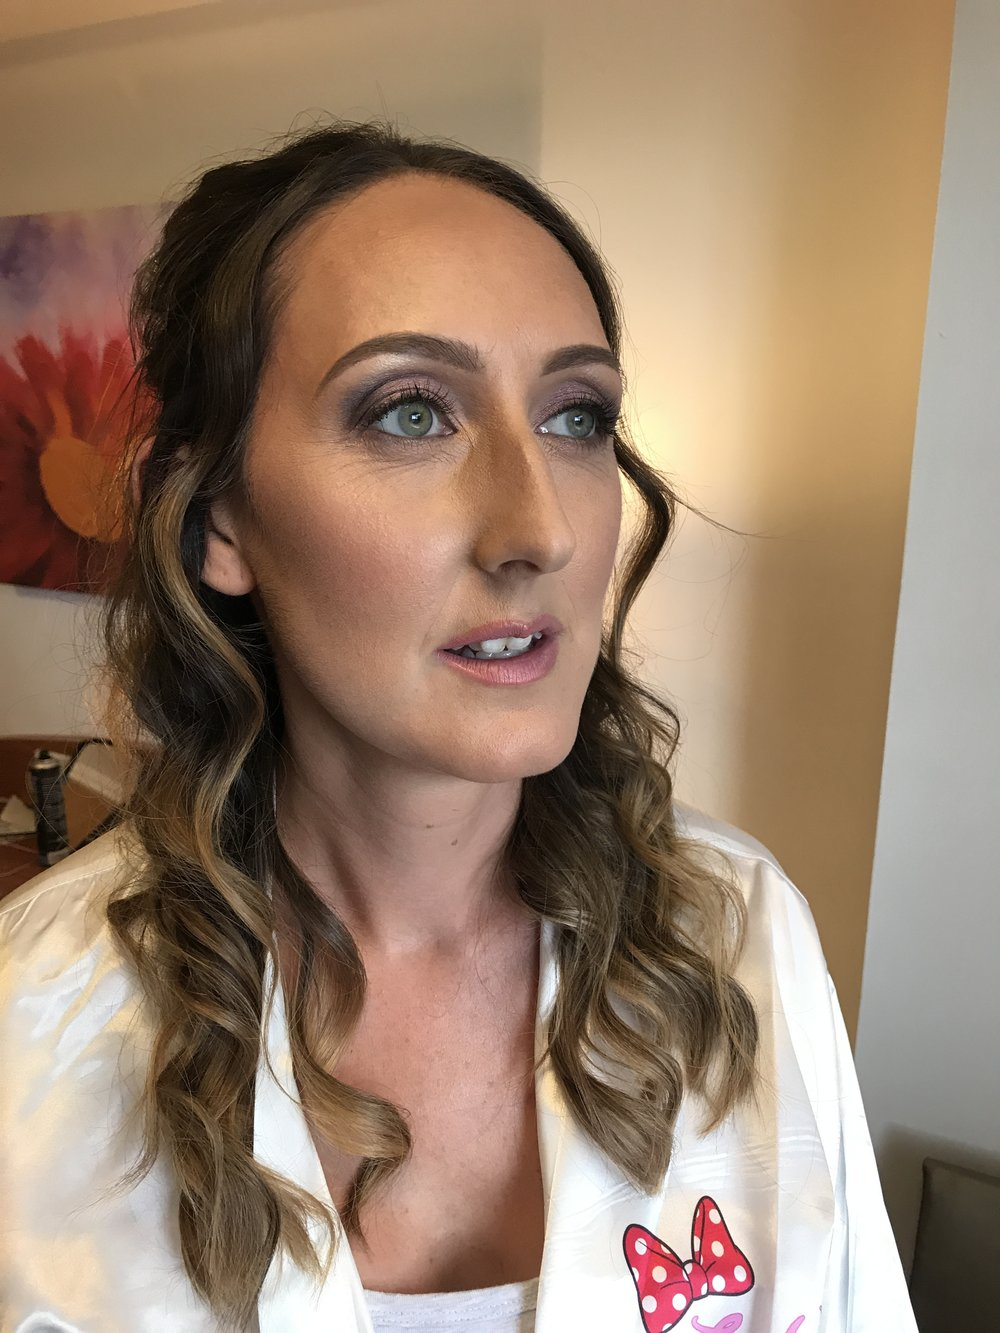 Makeup by Toni Cassidy - Glamavan